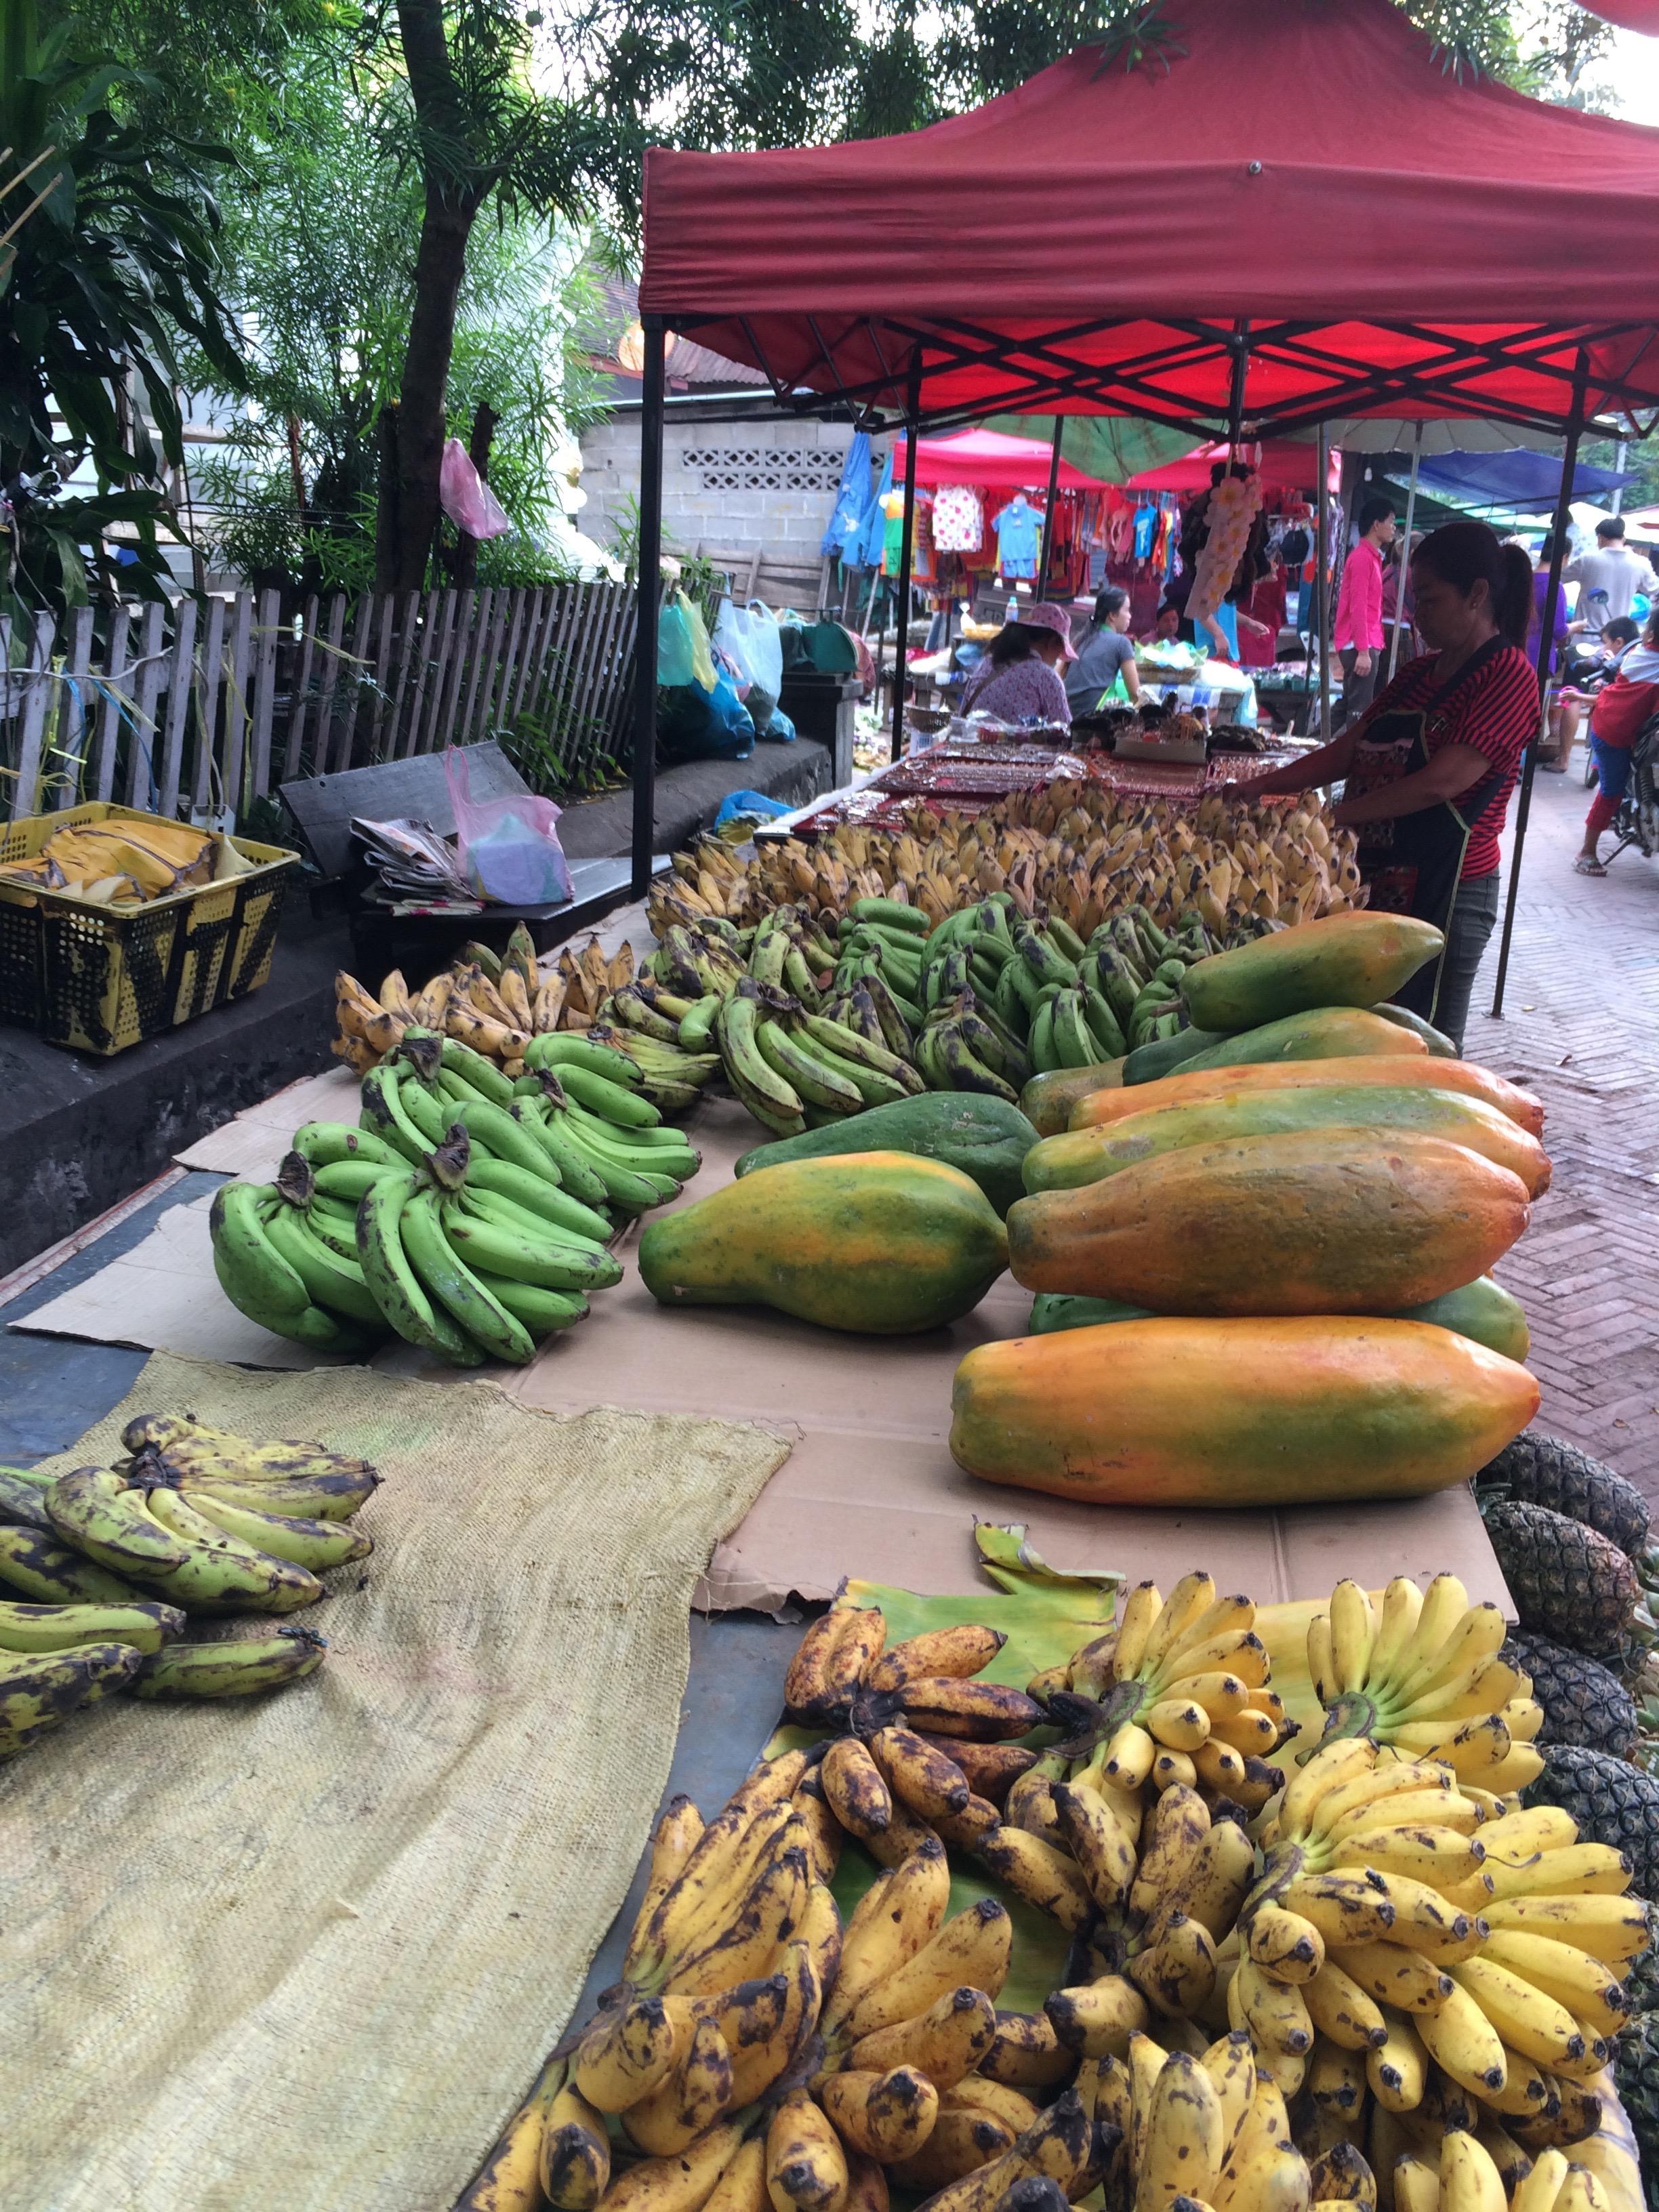 Biggest papayas next to the most diminutive bananas. Both intensely fabulous.